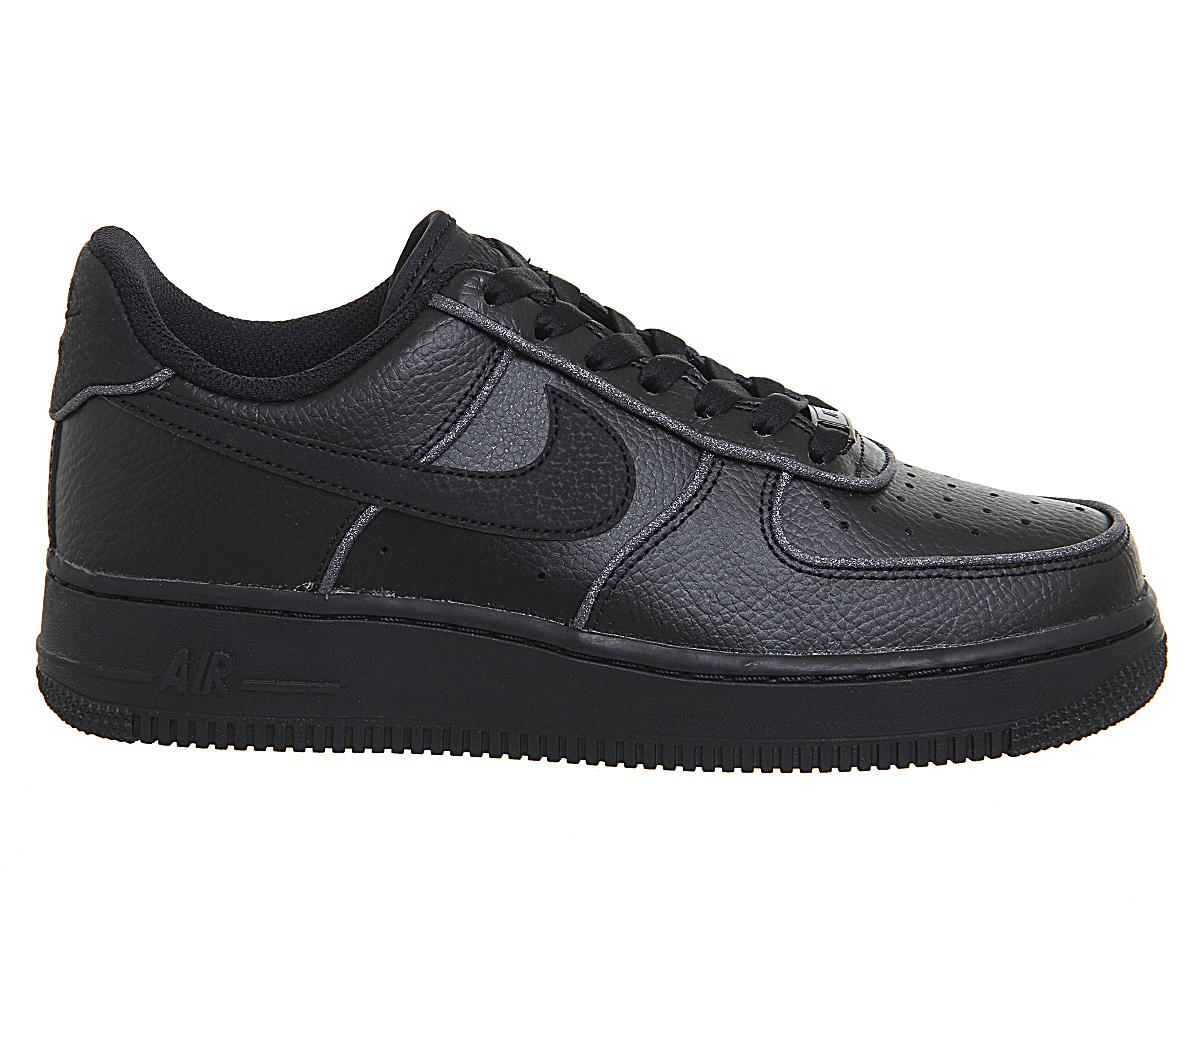 Nike Air Force 1 07 Trainers Black